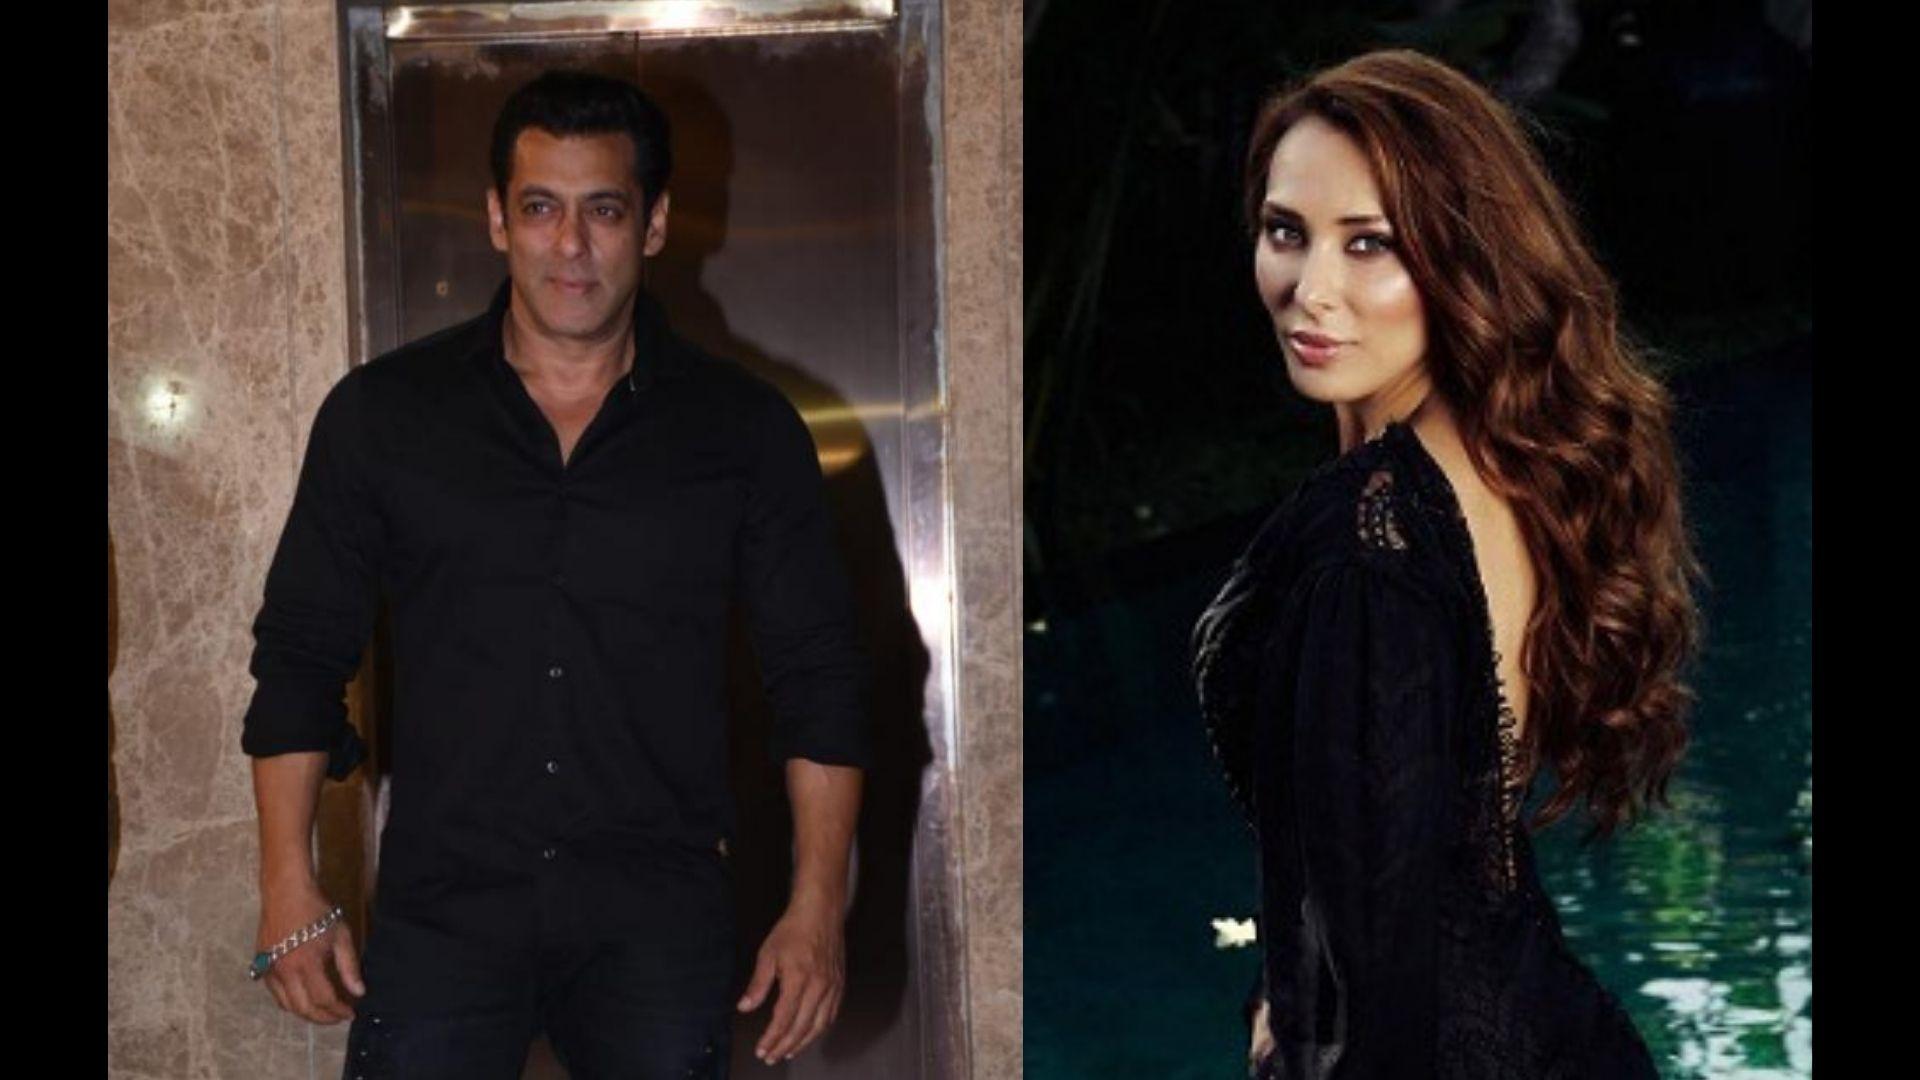 Aayush Sharma Birthday Bash: Salman Khan Twins With Rumoured GF Lulia Vantur – Riteish Deshmukh, Isabelle Kaif, Sunil Grover And Others Attend Party